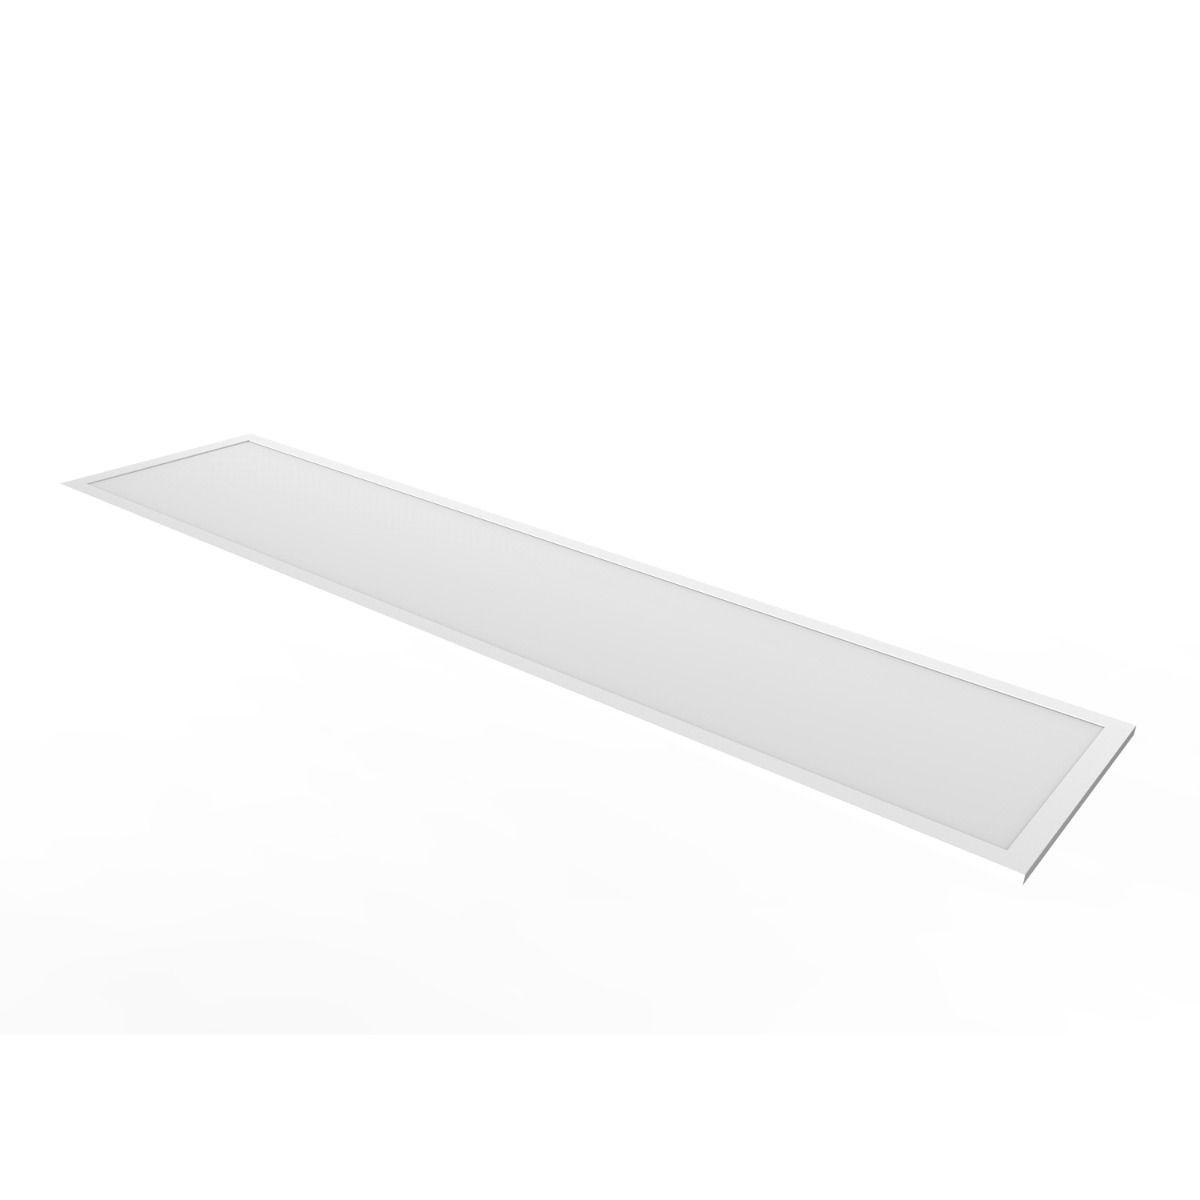 Noxion LED Panel Ecowhite V2.0 30x120cm 6500K 36W UGR <22 | Daylight - Replaces 2x36W